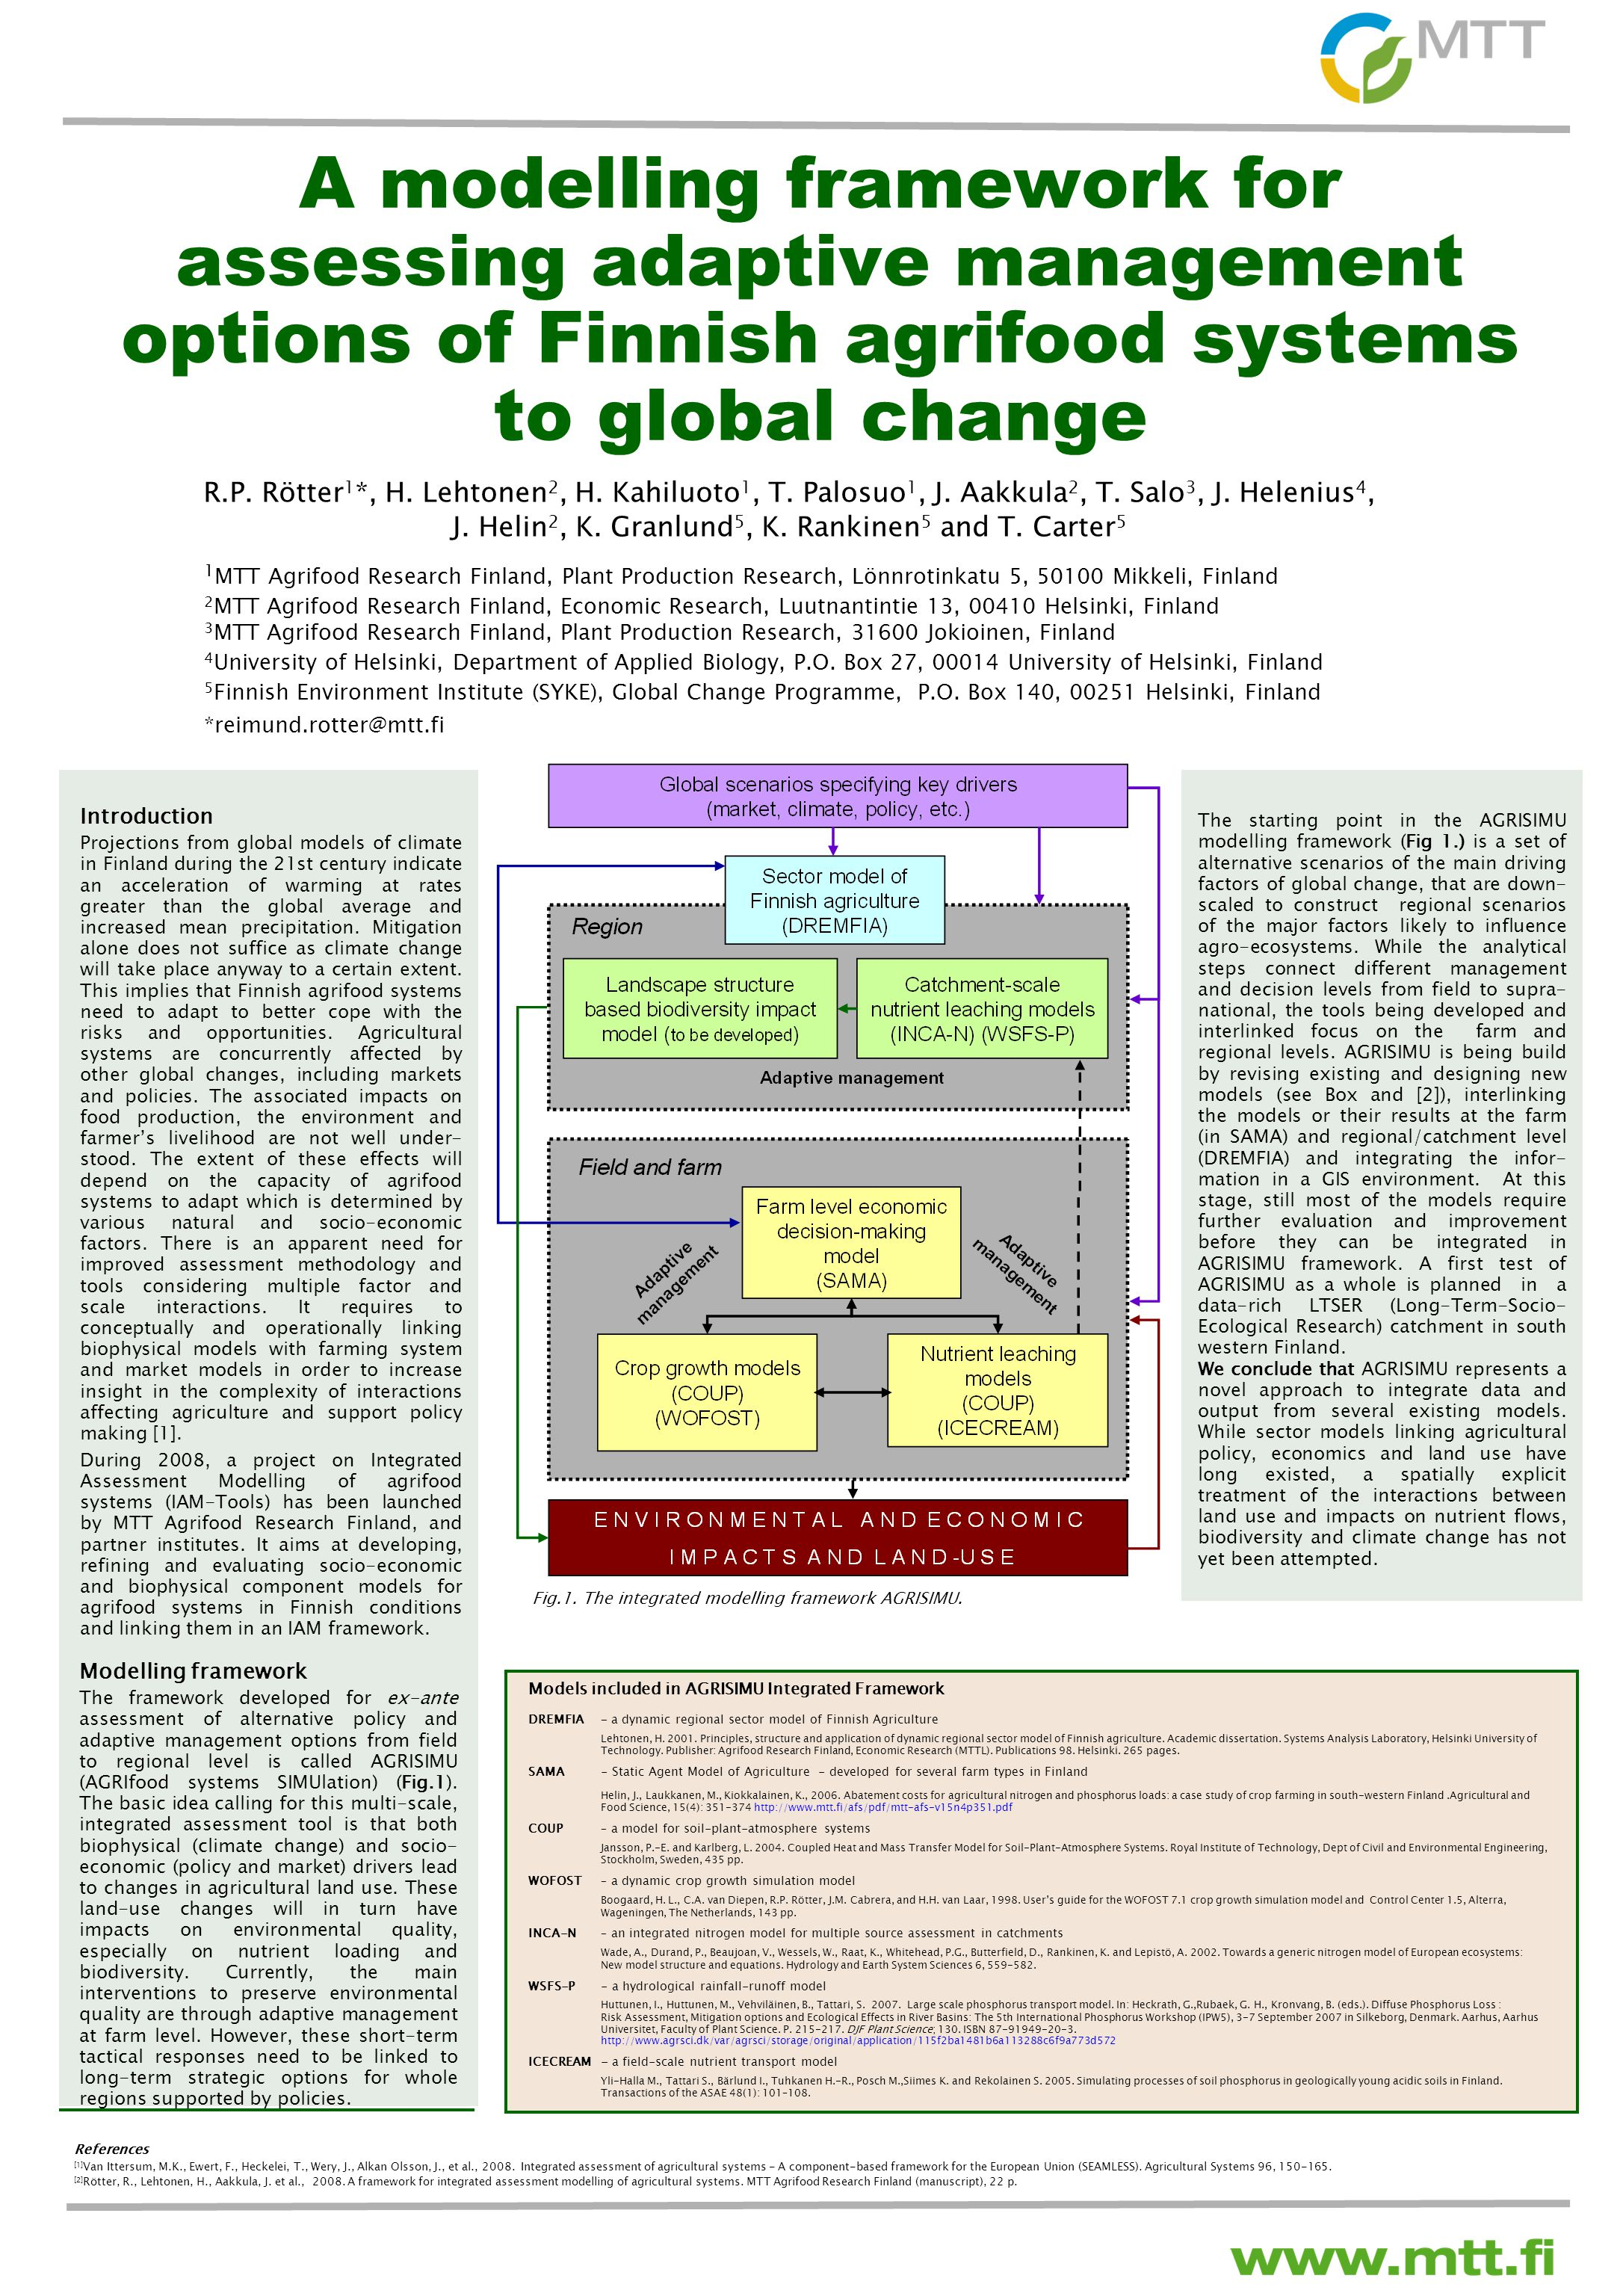 A modelling framework for assessing adaptive management options of Finnish agrifood systems to global change R.P. Rötter 1 *, H. Lehtonen 2, H. Kahilu